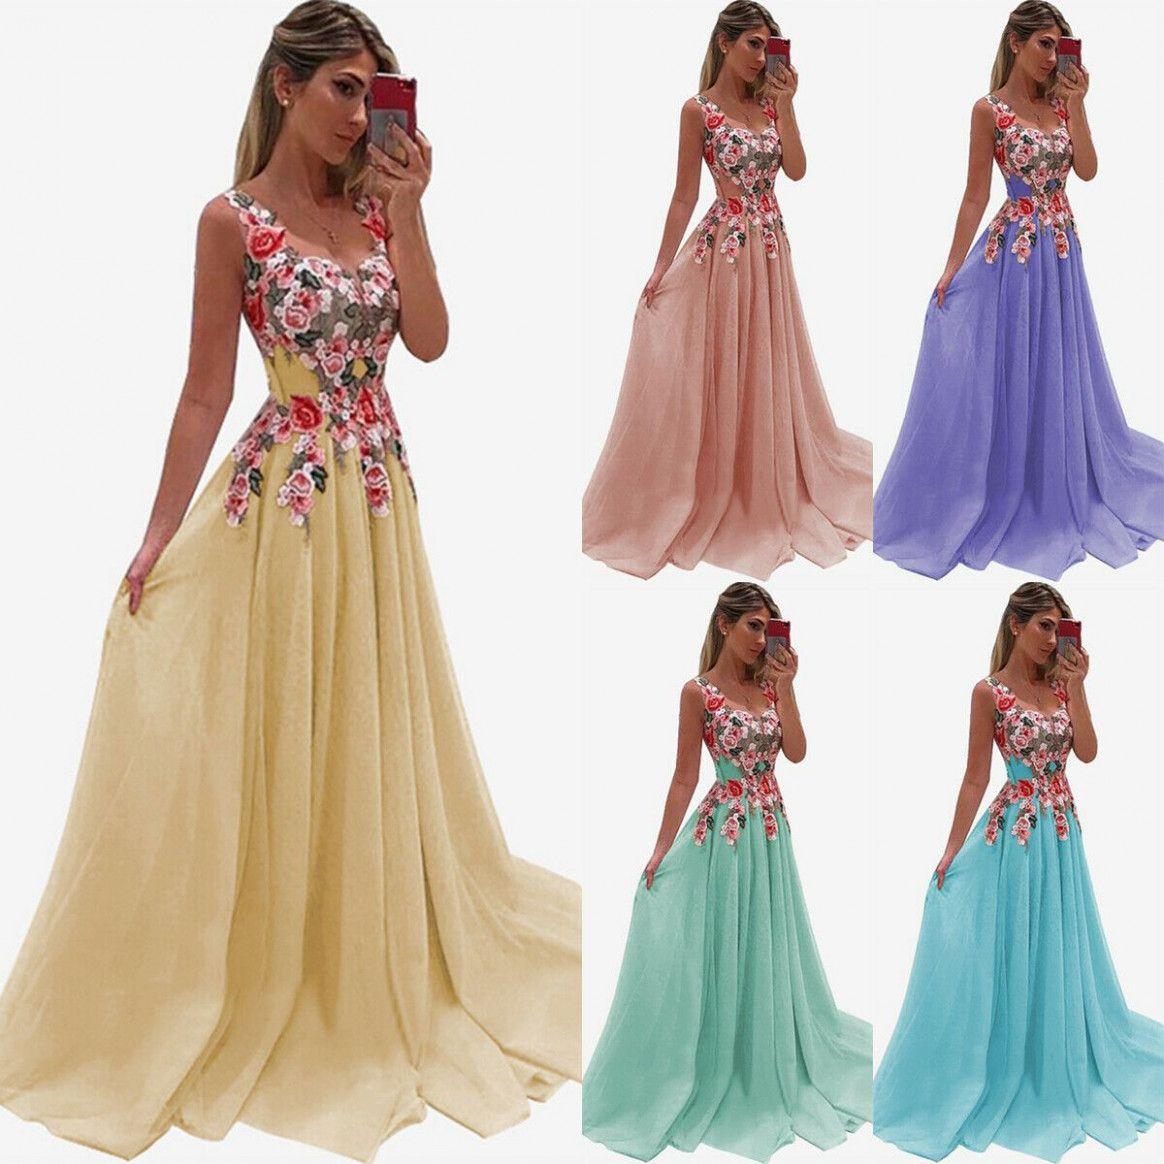 19 Sommer Abendkleider in 19  Abendkleid, Maxi kleider sommer